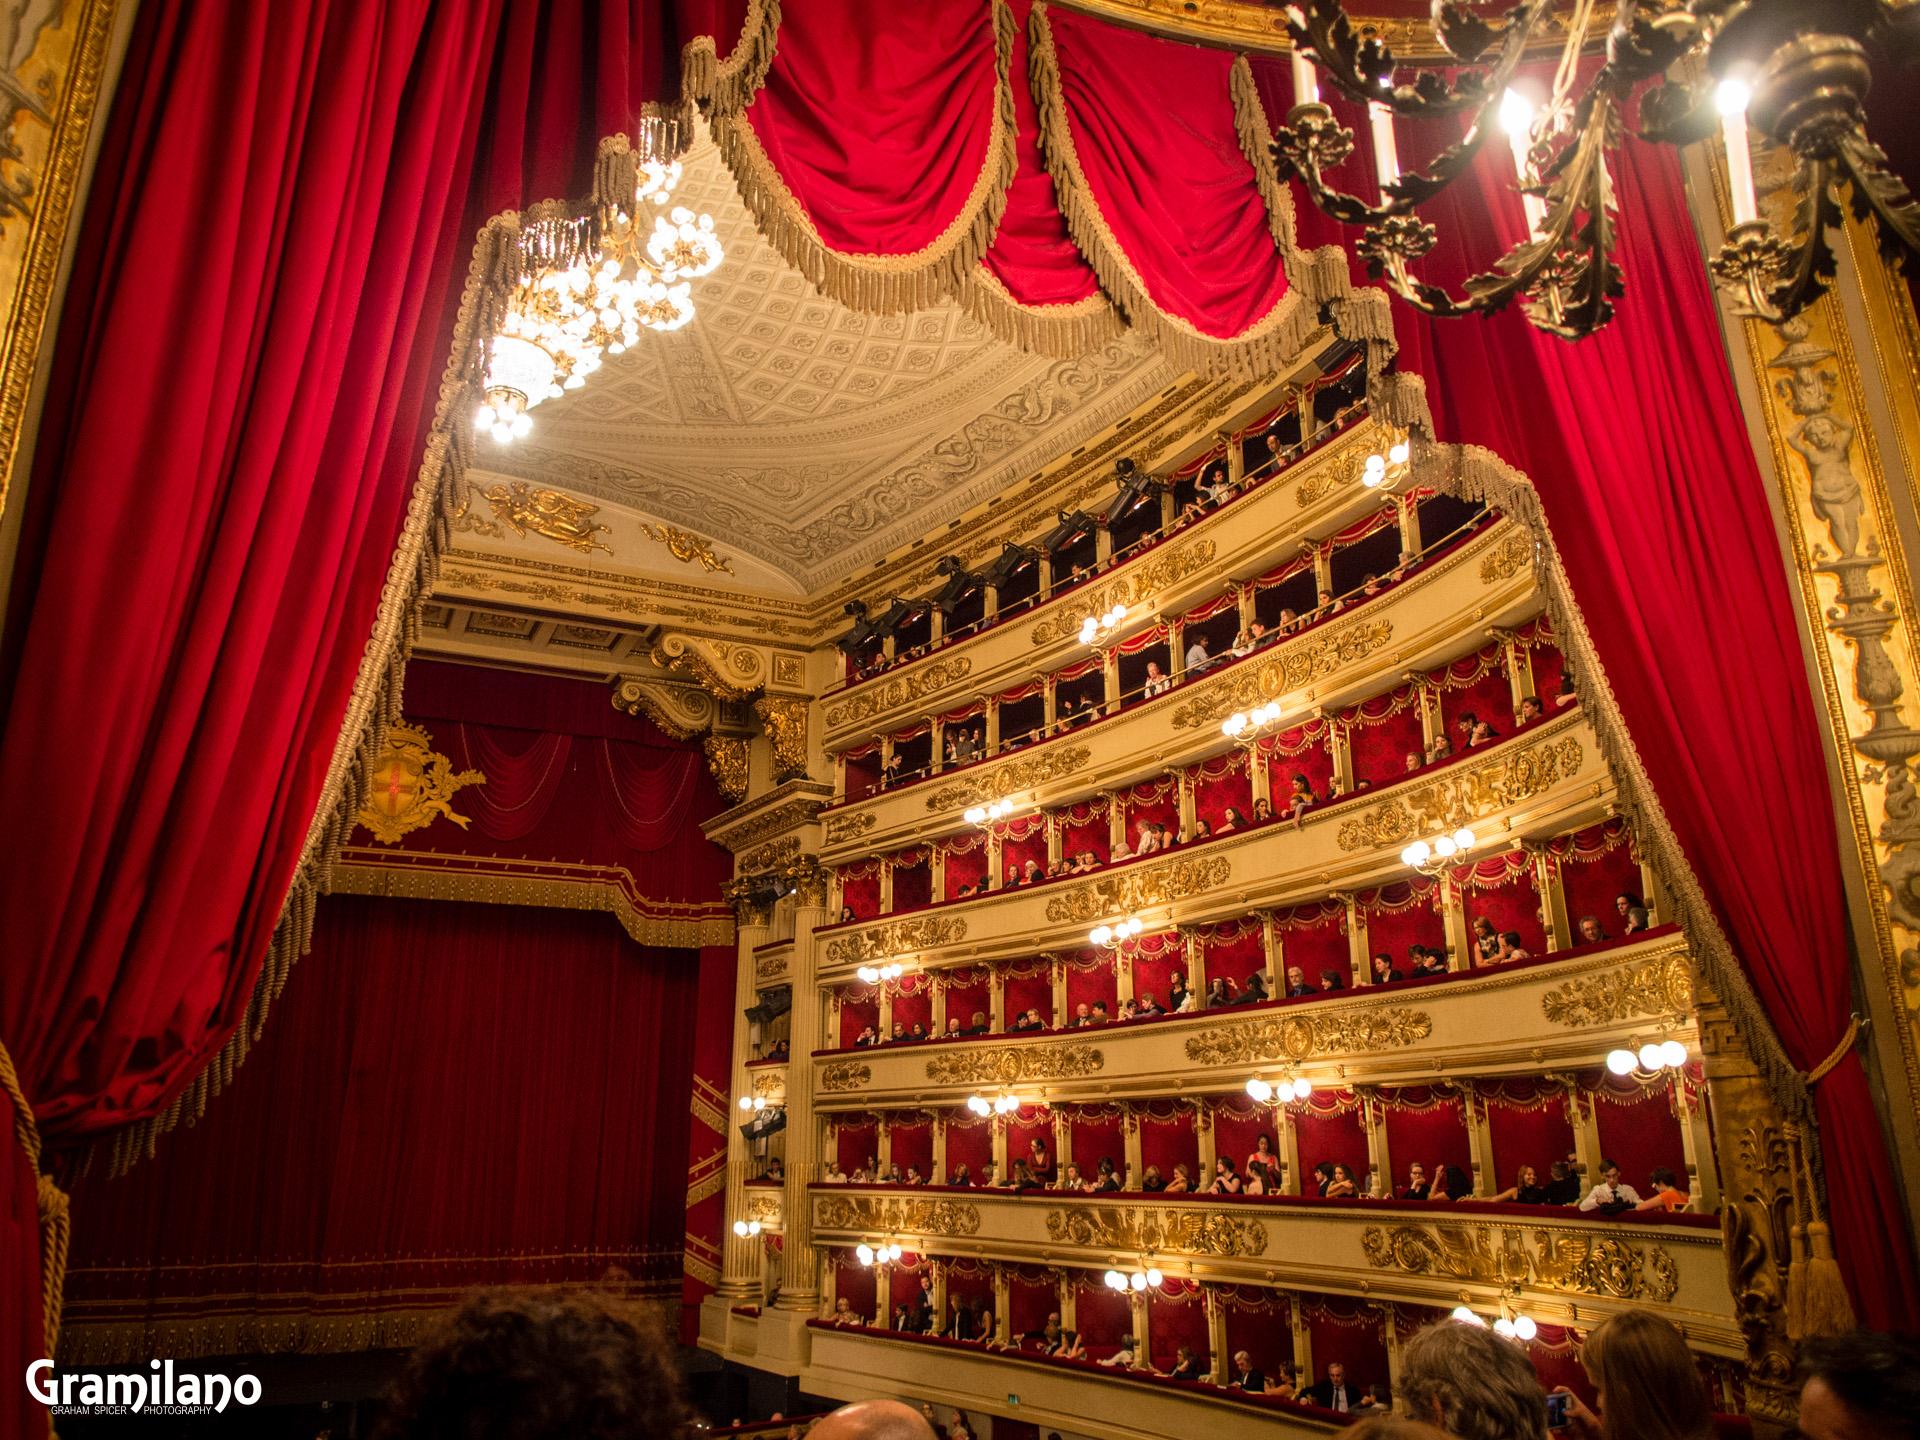 Royal Box, Teatro alla Scala, Milan